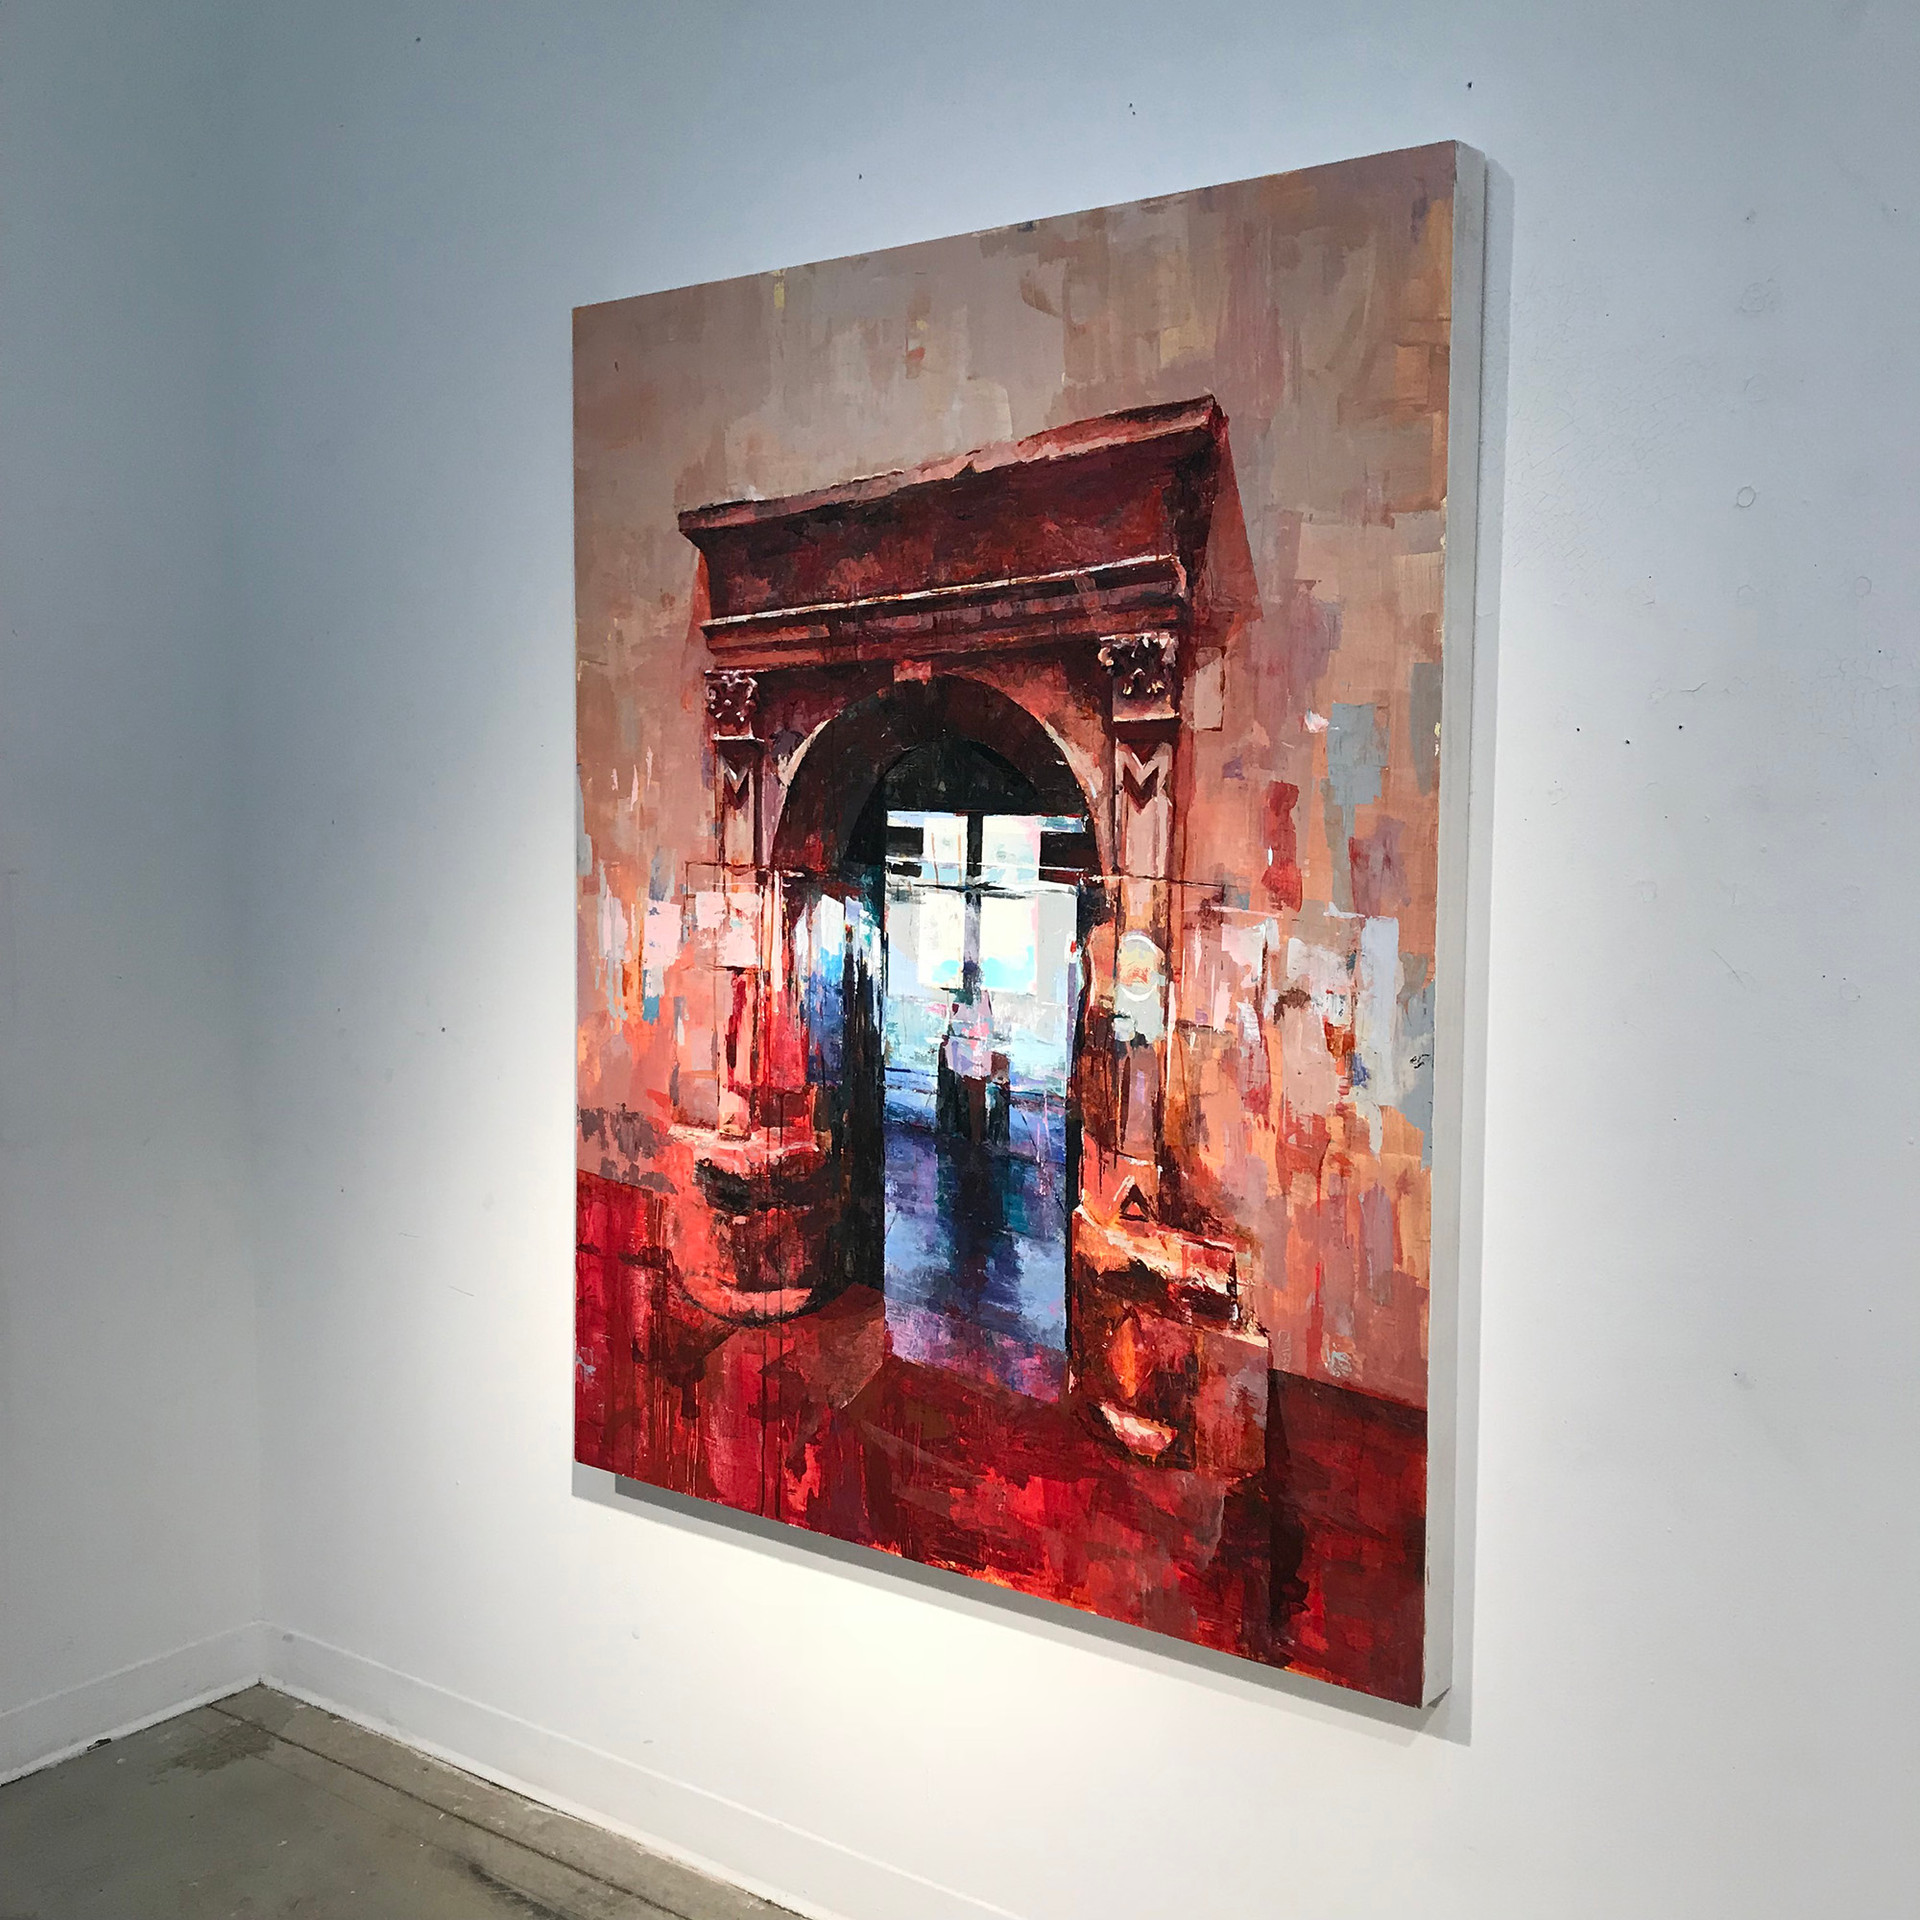 Threshold [Gallery View]